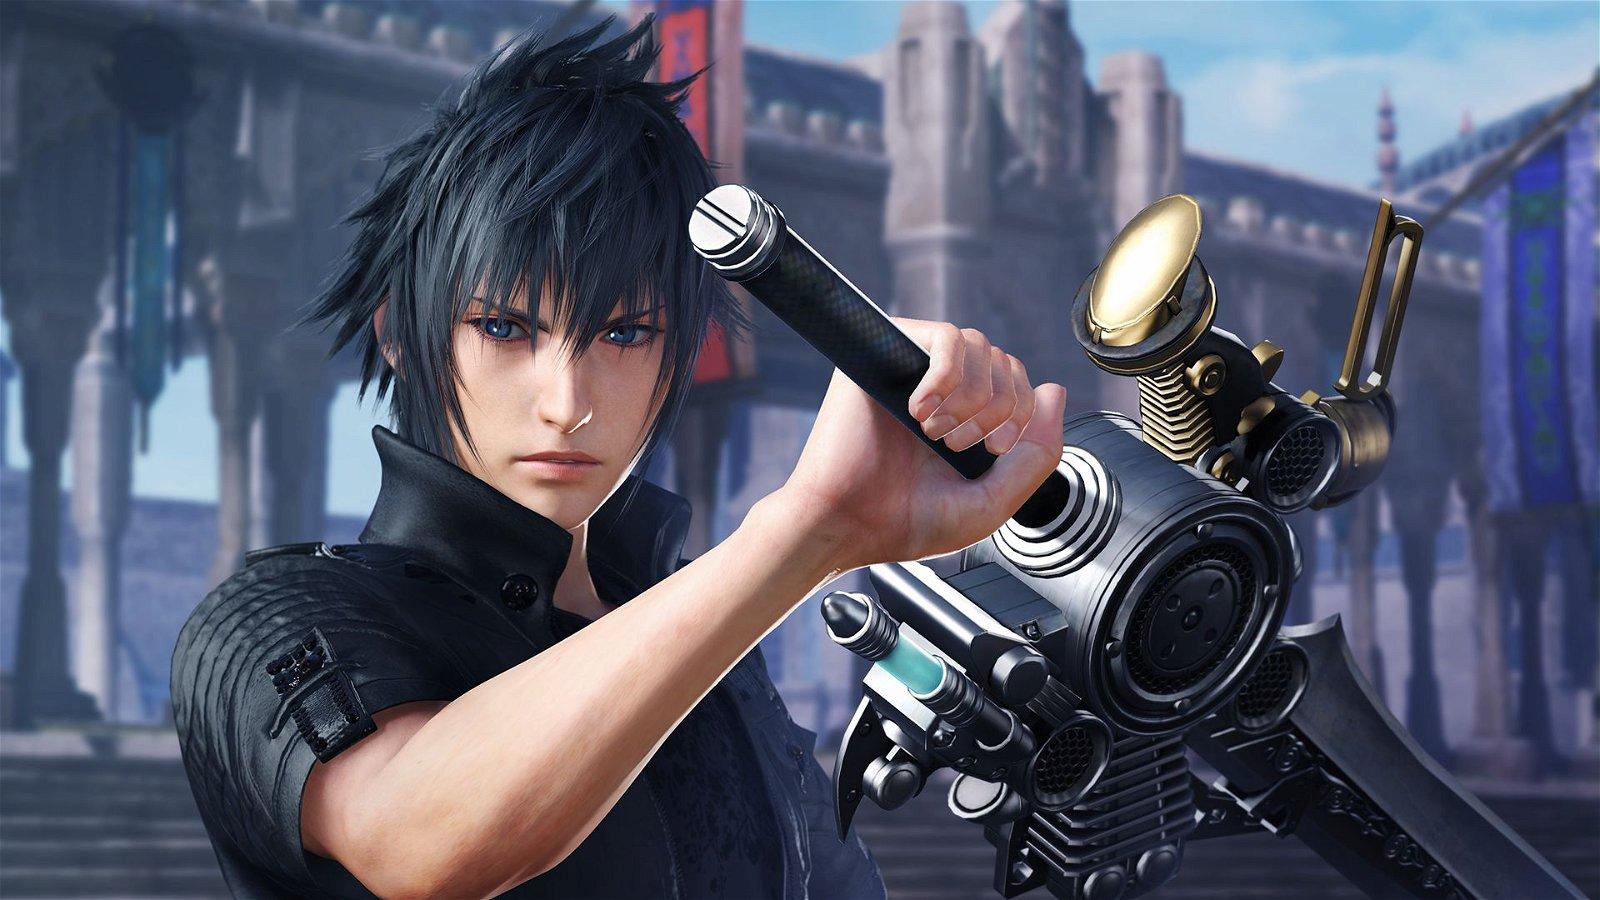 Square Enix Unveils New Dissidia Opening Cinematic and Cutscene